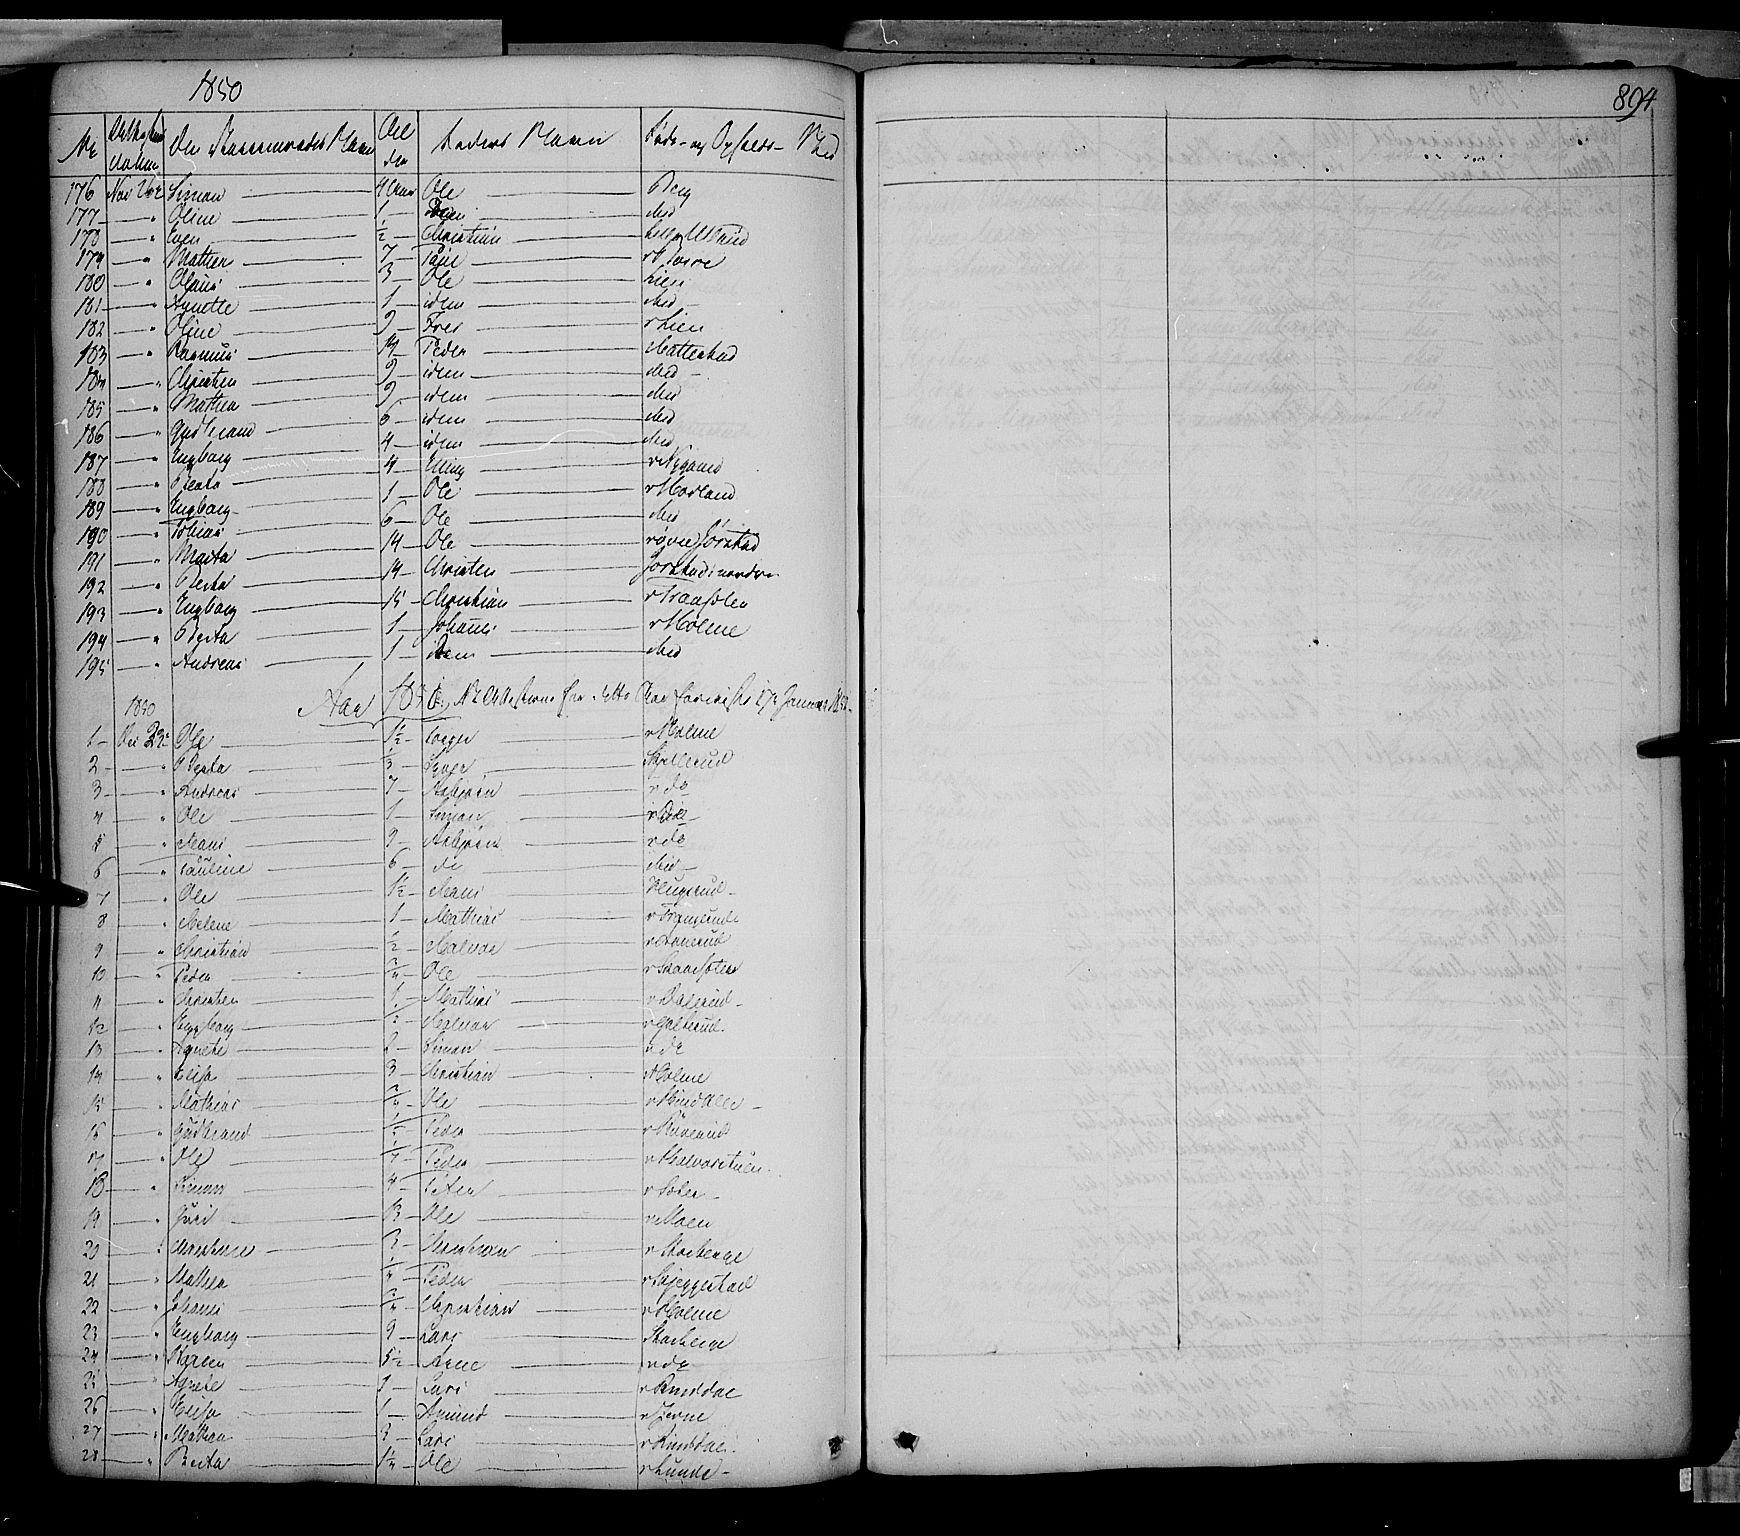 SAH, Fåberg prestekontor, Ministerialbok nr. 5, 1836-1854, s. 893-894